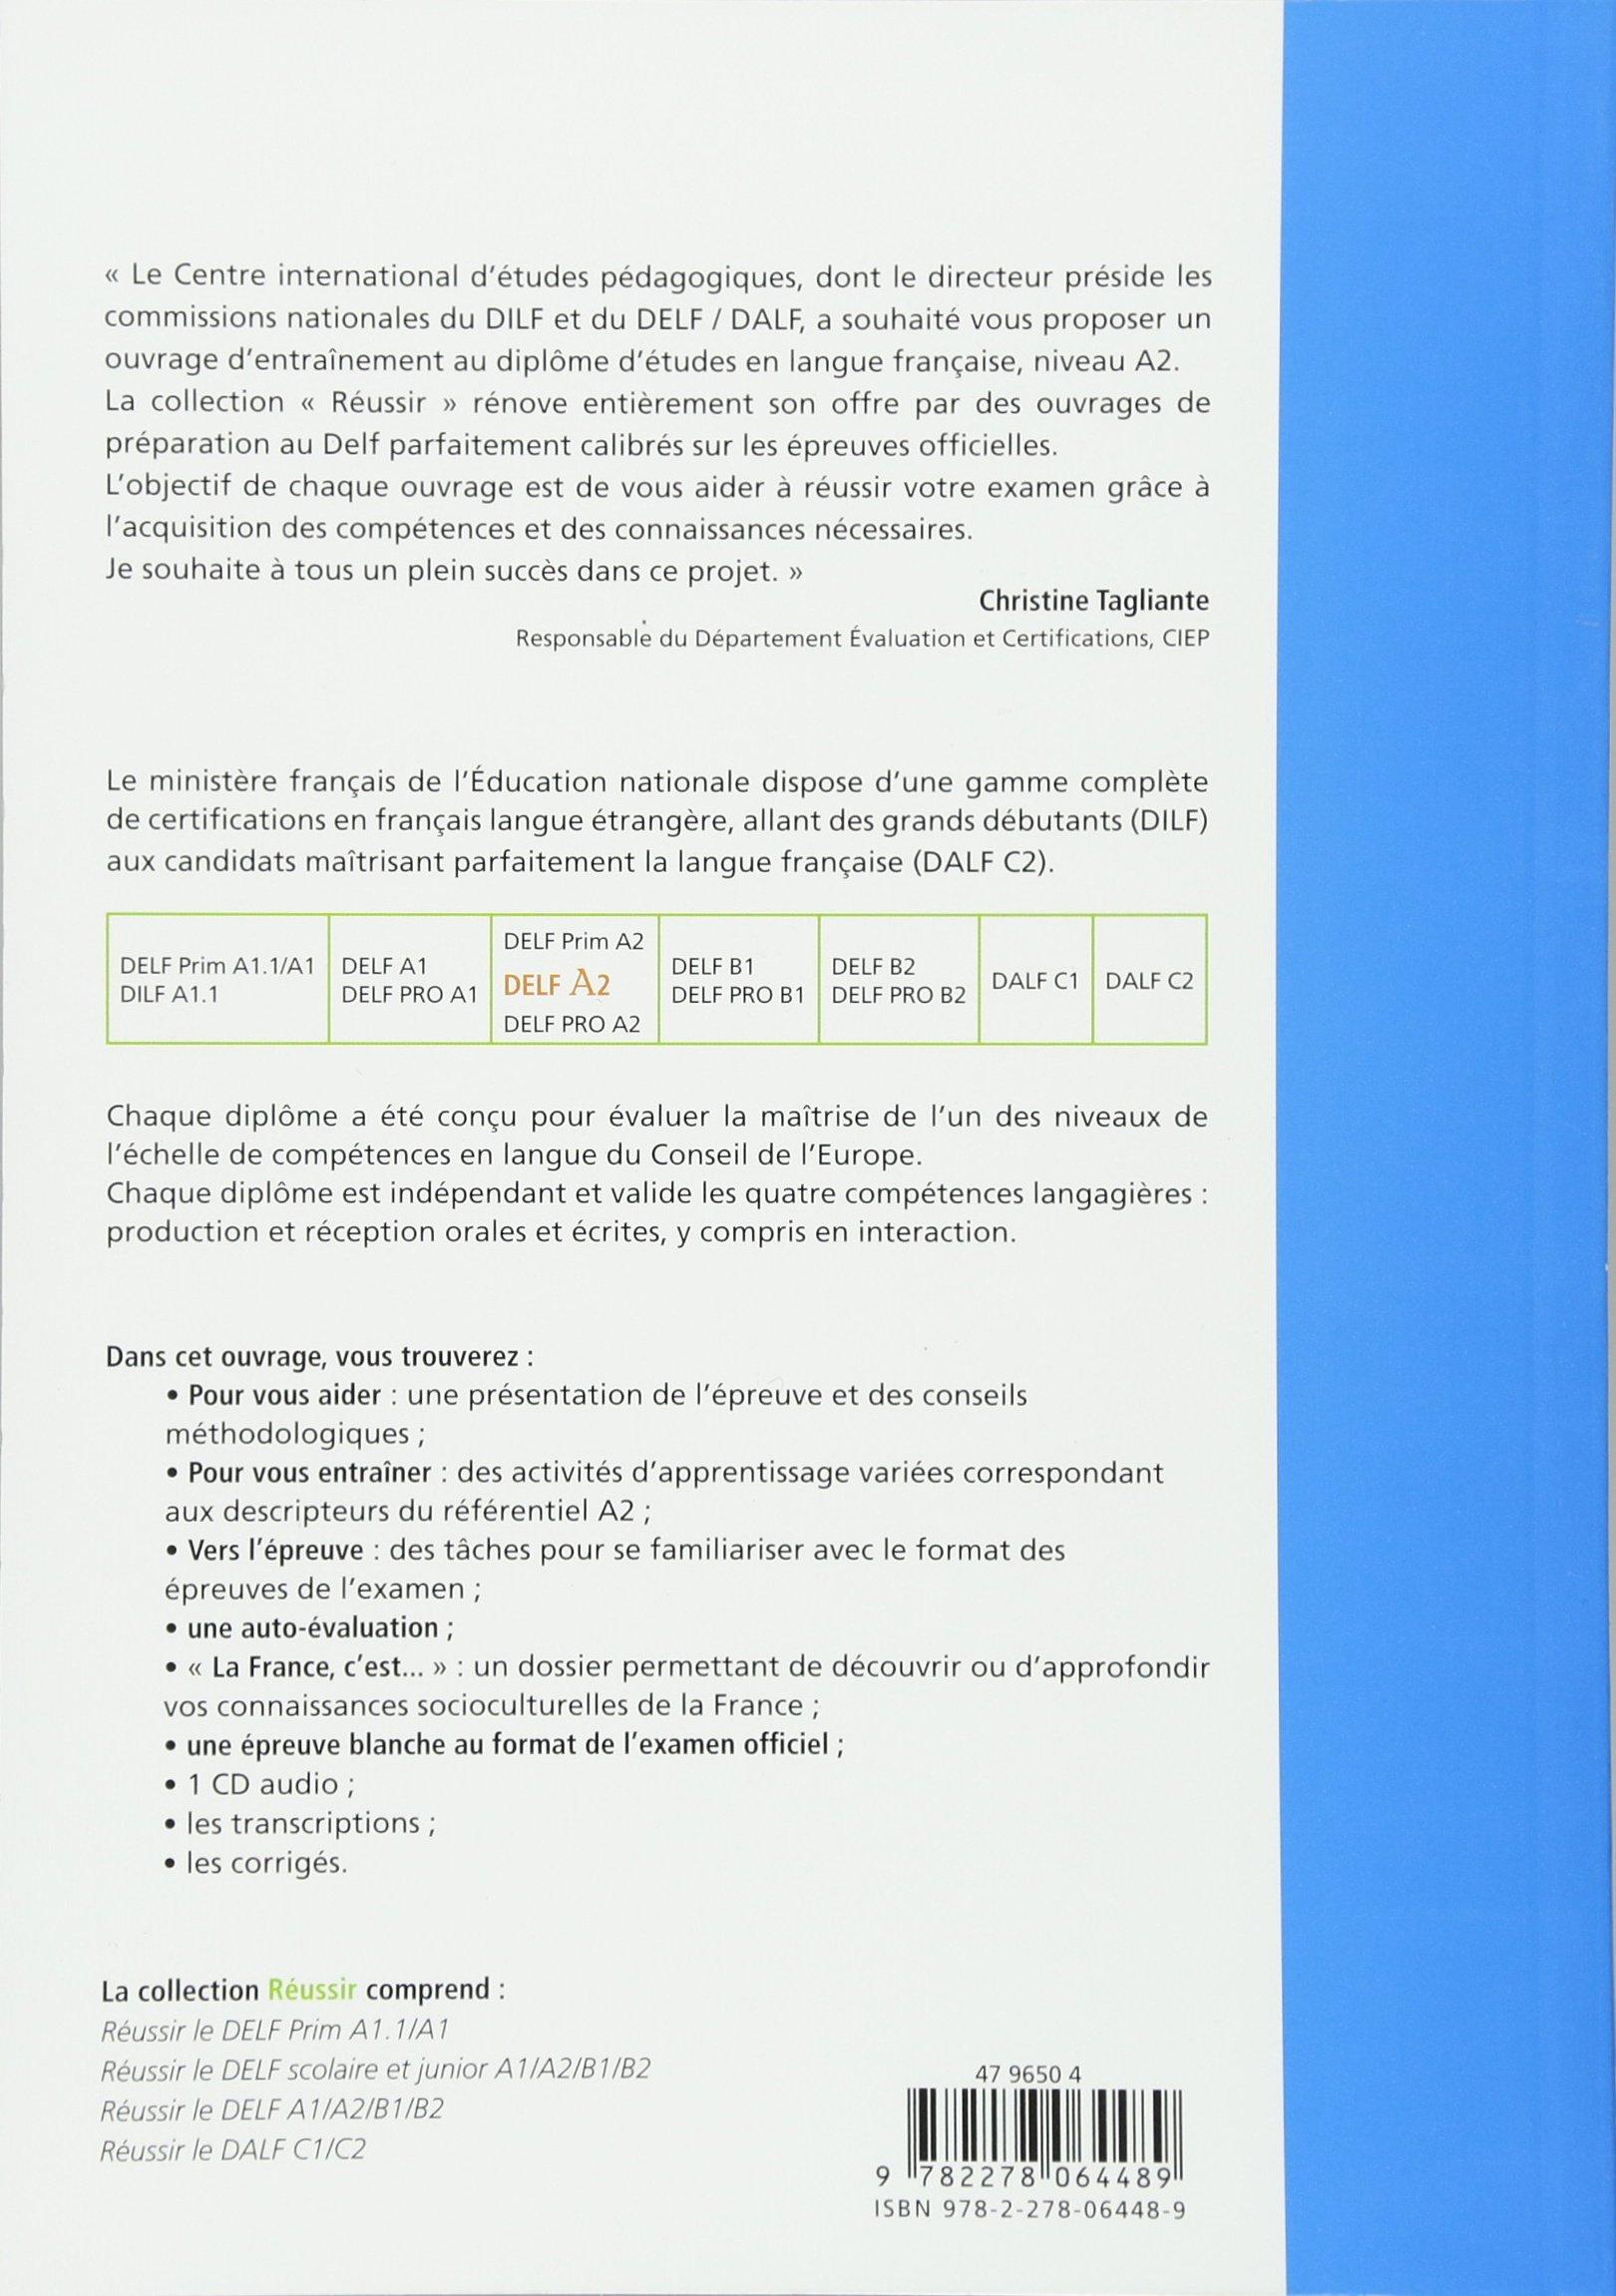 Reussir Le Delf Edition: Livre A2 & CD Audio (French Edition)